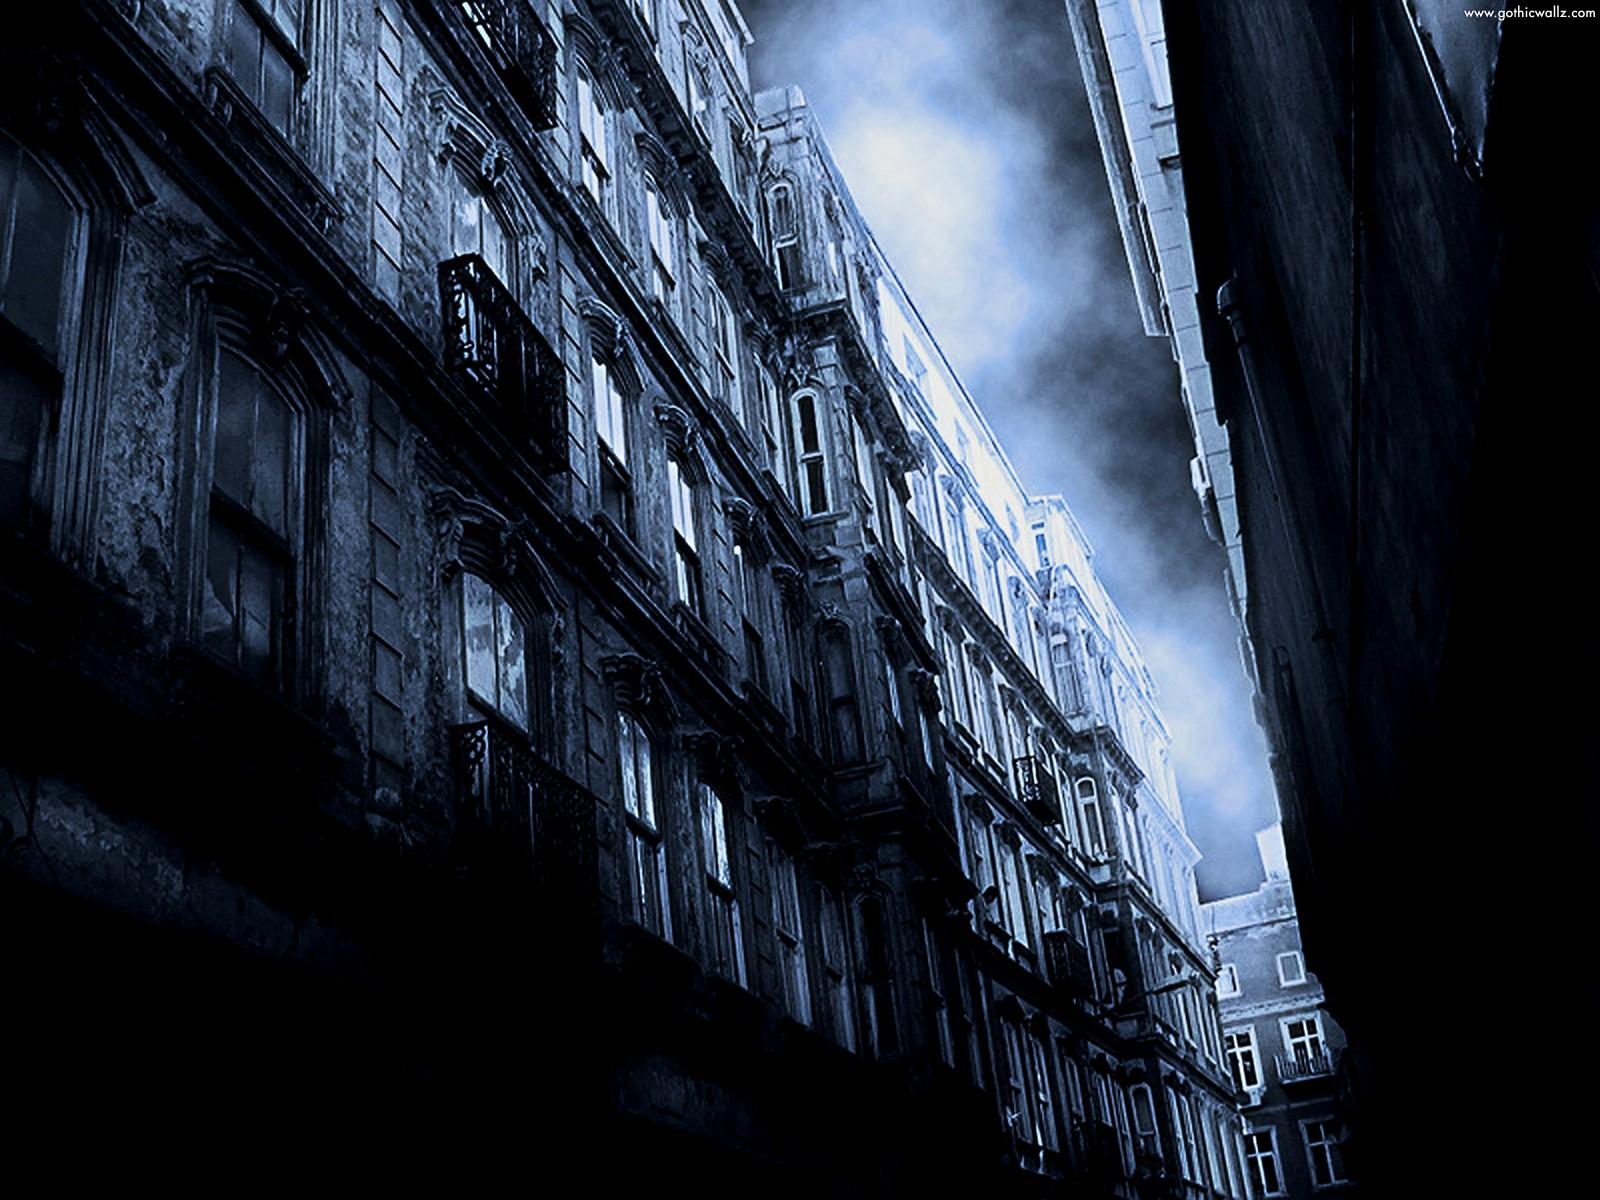 http://2.bp.blogspot.com/_-jo2ZCYhKaY/TTAu44XoR7I/AAAAAAAAIiQ/qRg5OZCZcn0/s1600/gothic-wallpapers-25++%28gothicwallz.blogspot.com%29.jpg